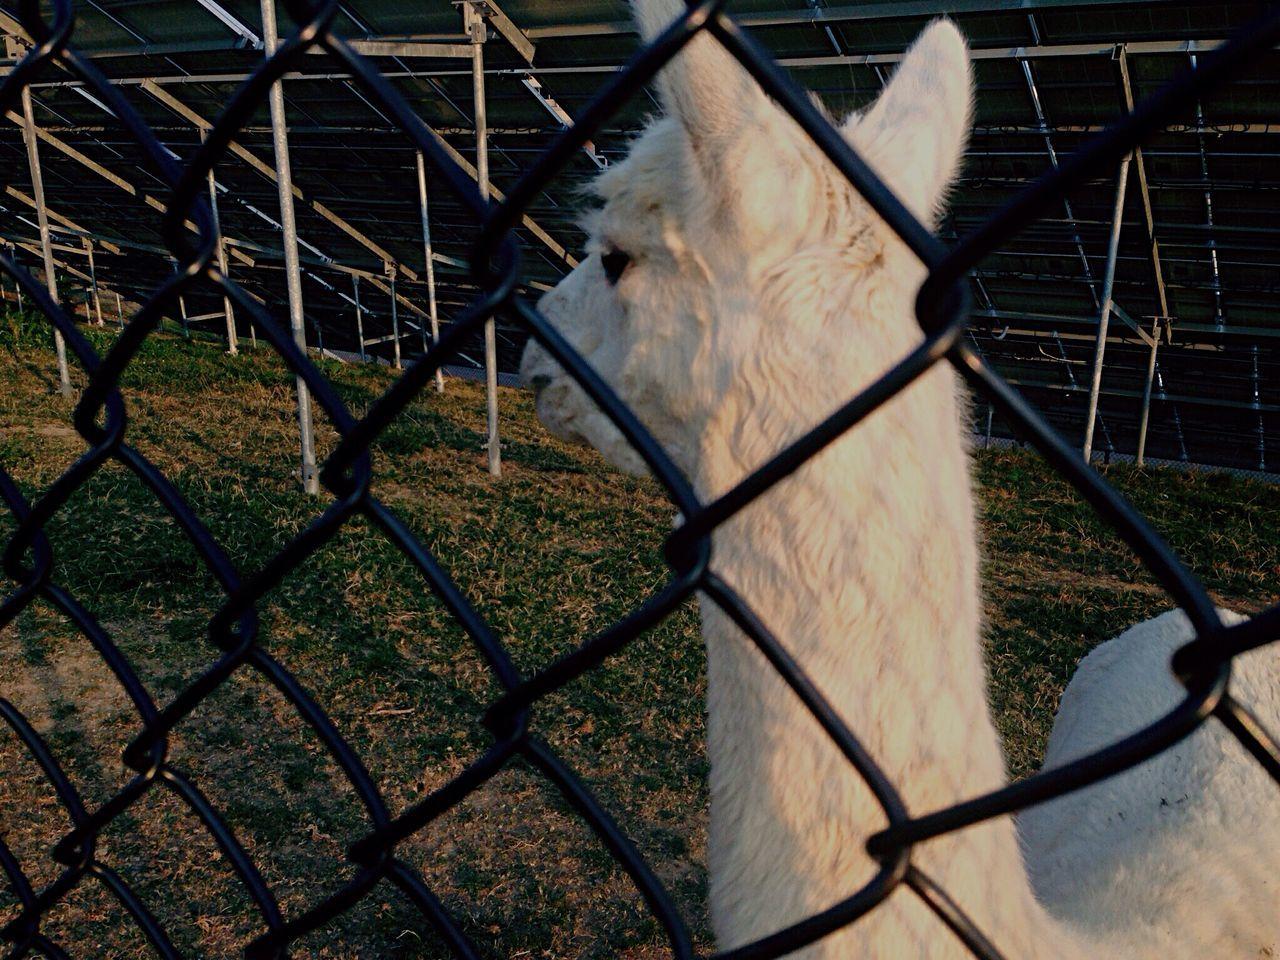 Animal Photography Alpaca High School Memories High School Photography Junkie instagram: @8.Lbs